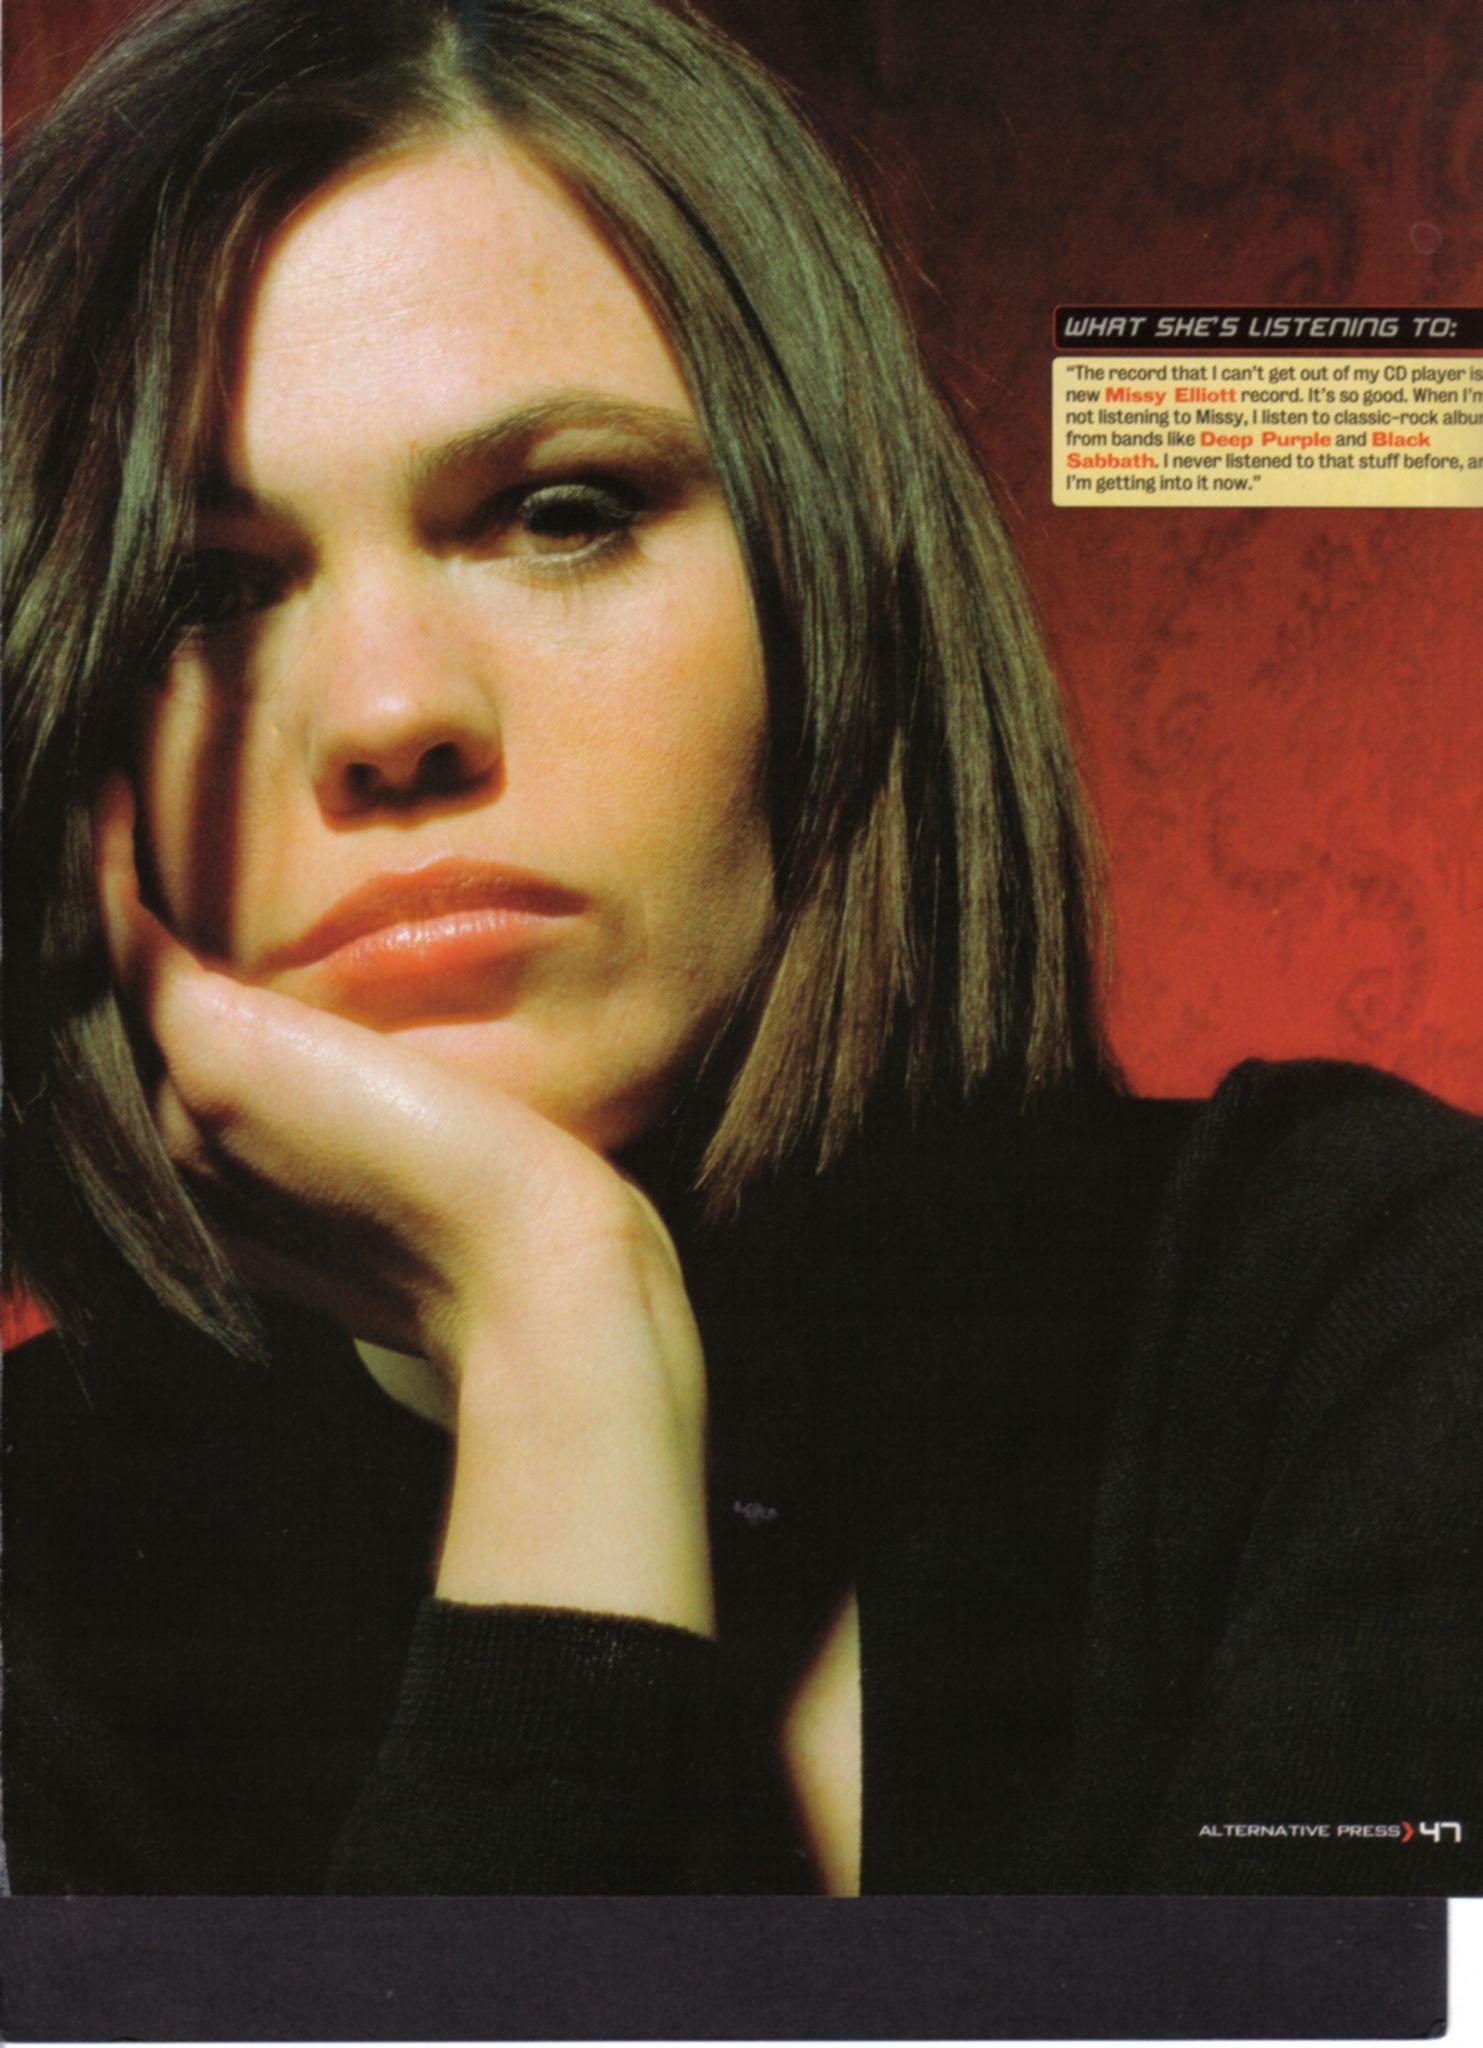 Wynwyn Marquez (b. 1992),Liza Huber Porno image Lauren-Marie Taylor,Jonas Armstrong (born 1981 (born in Dublin, Ireland)